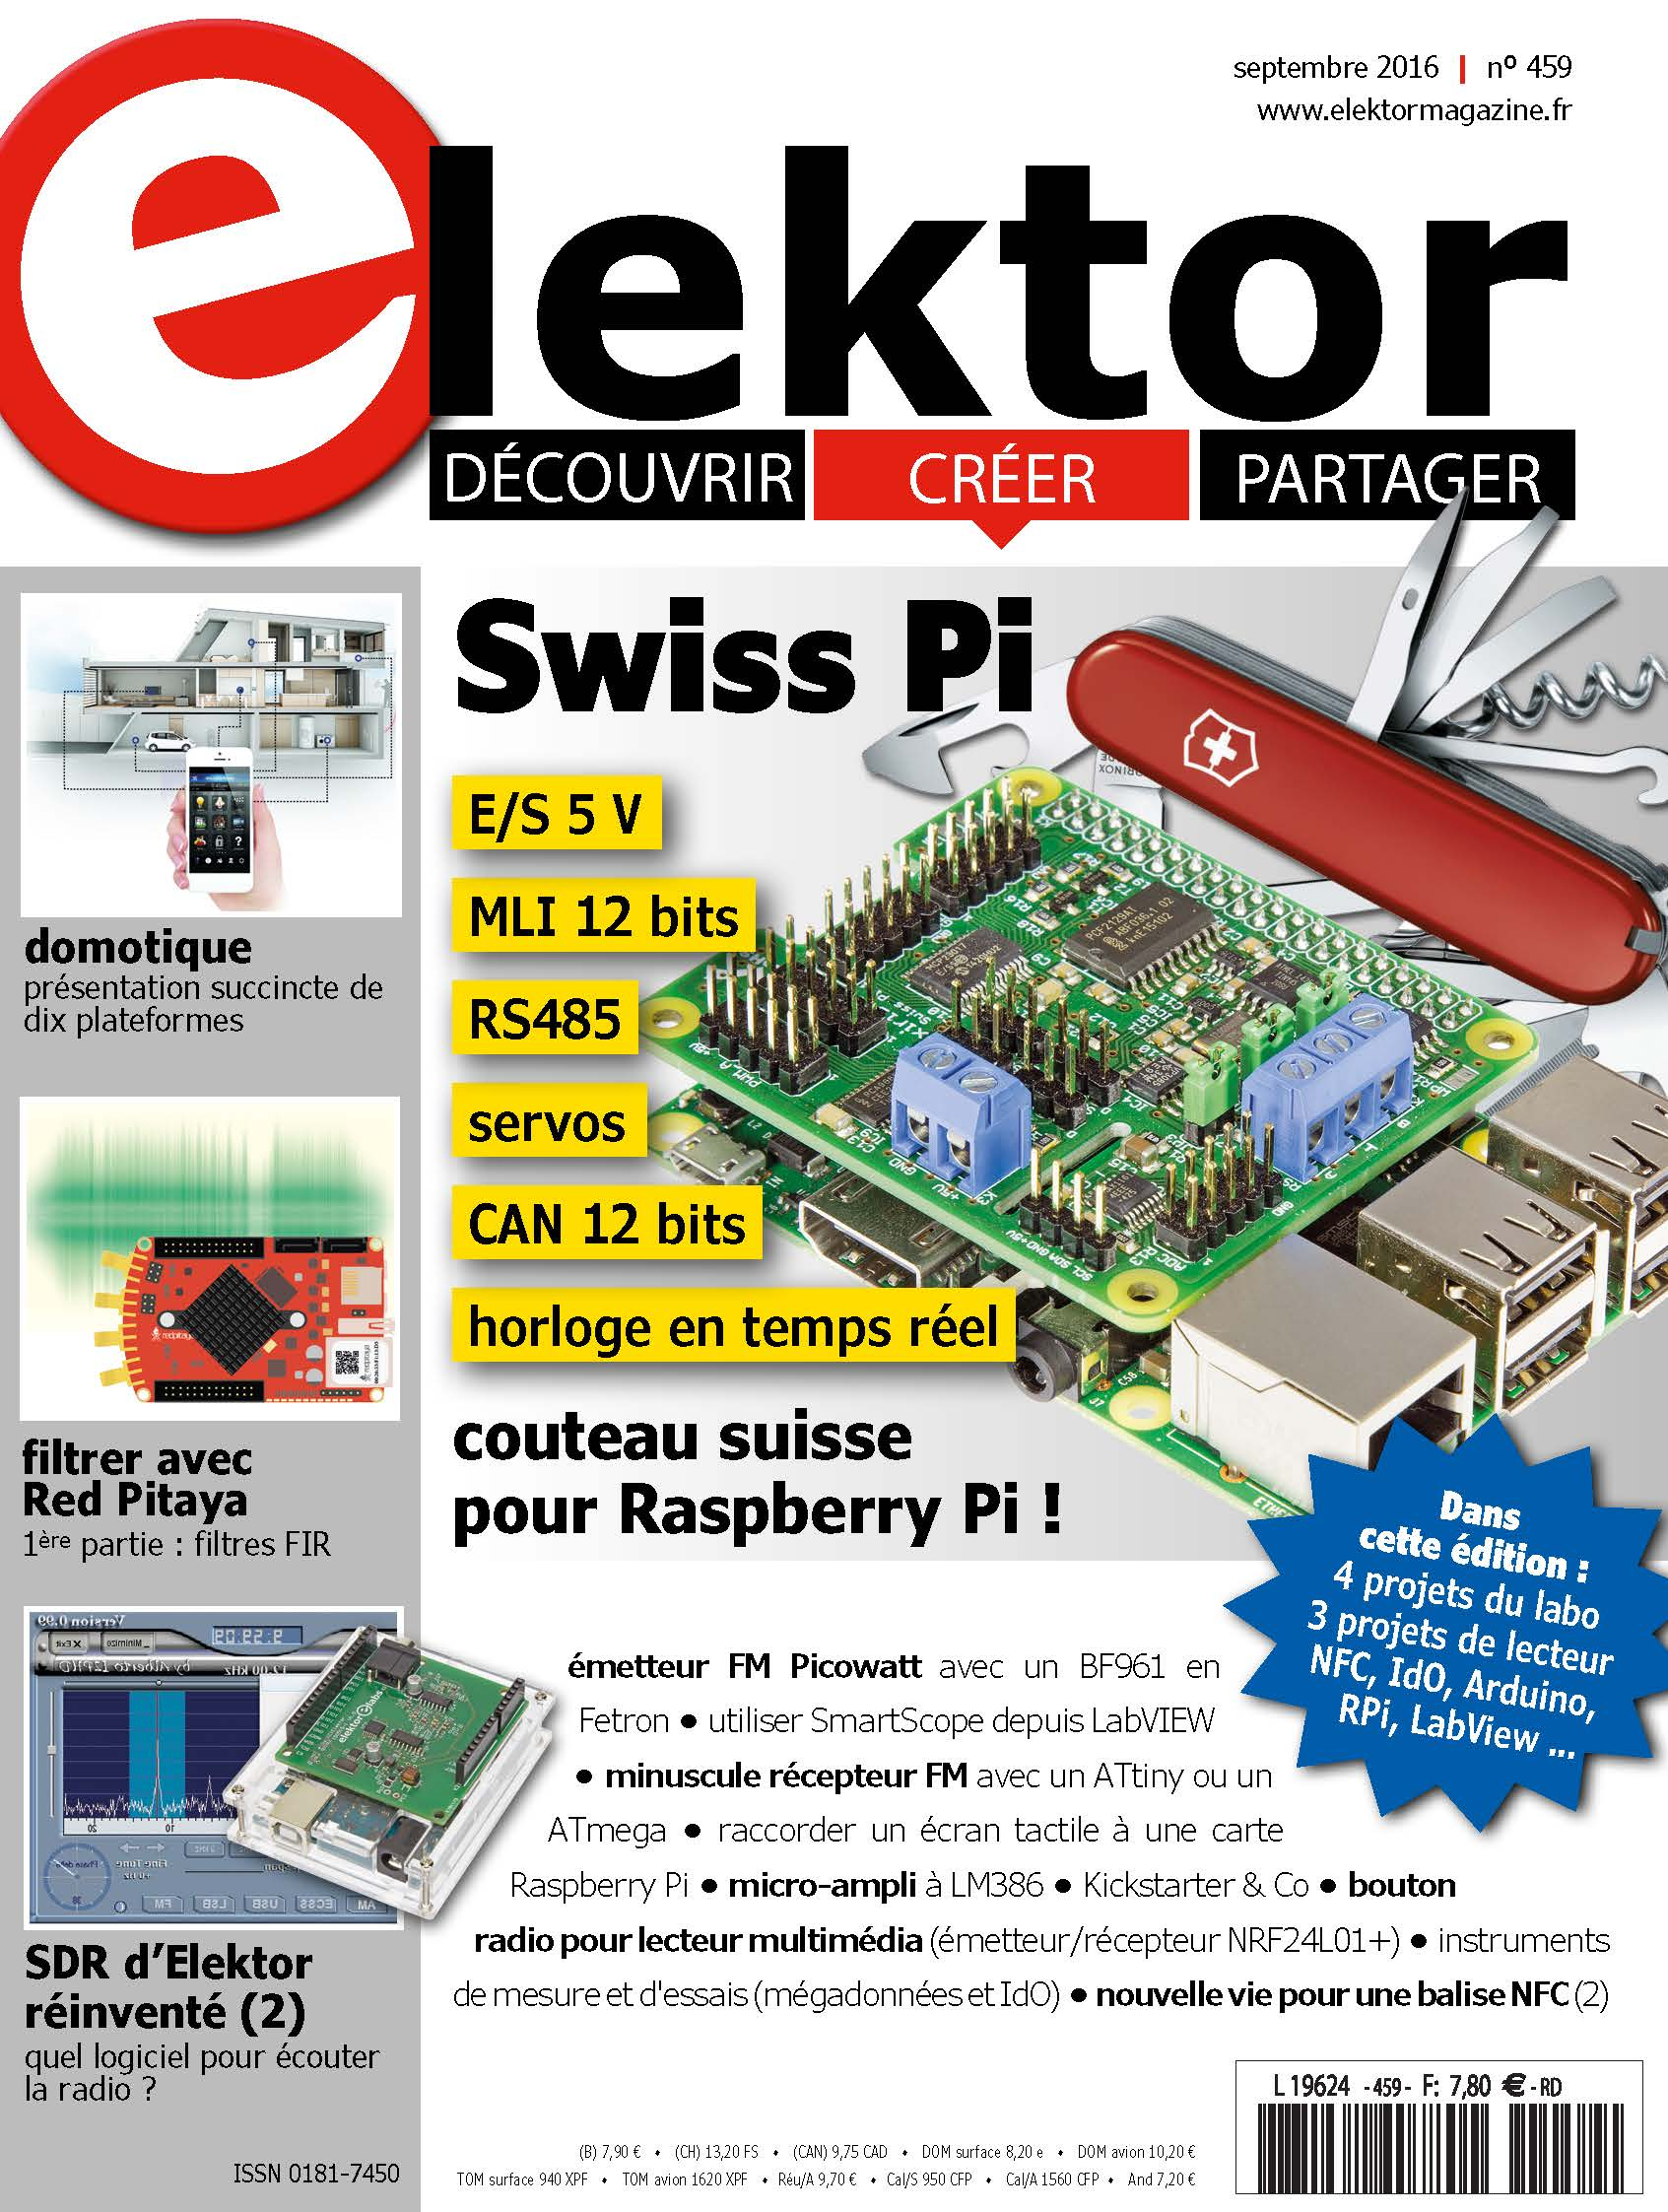 parution du numéro d'elektor de septembre 2016 | elektor magazine